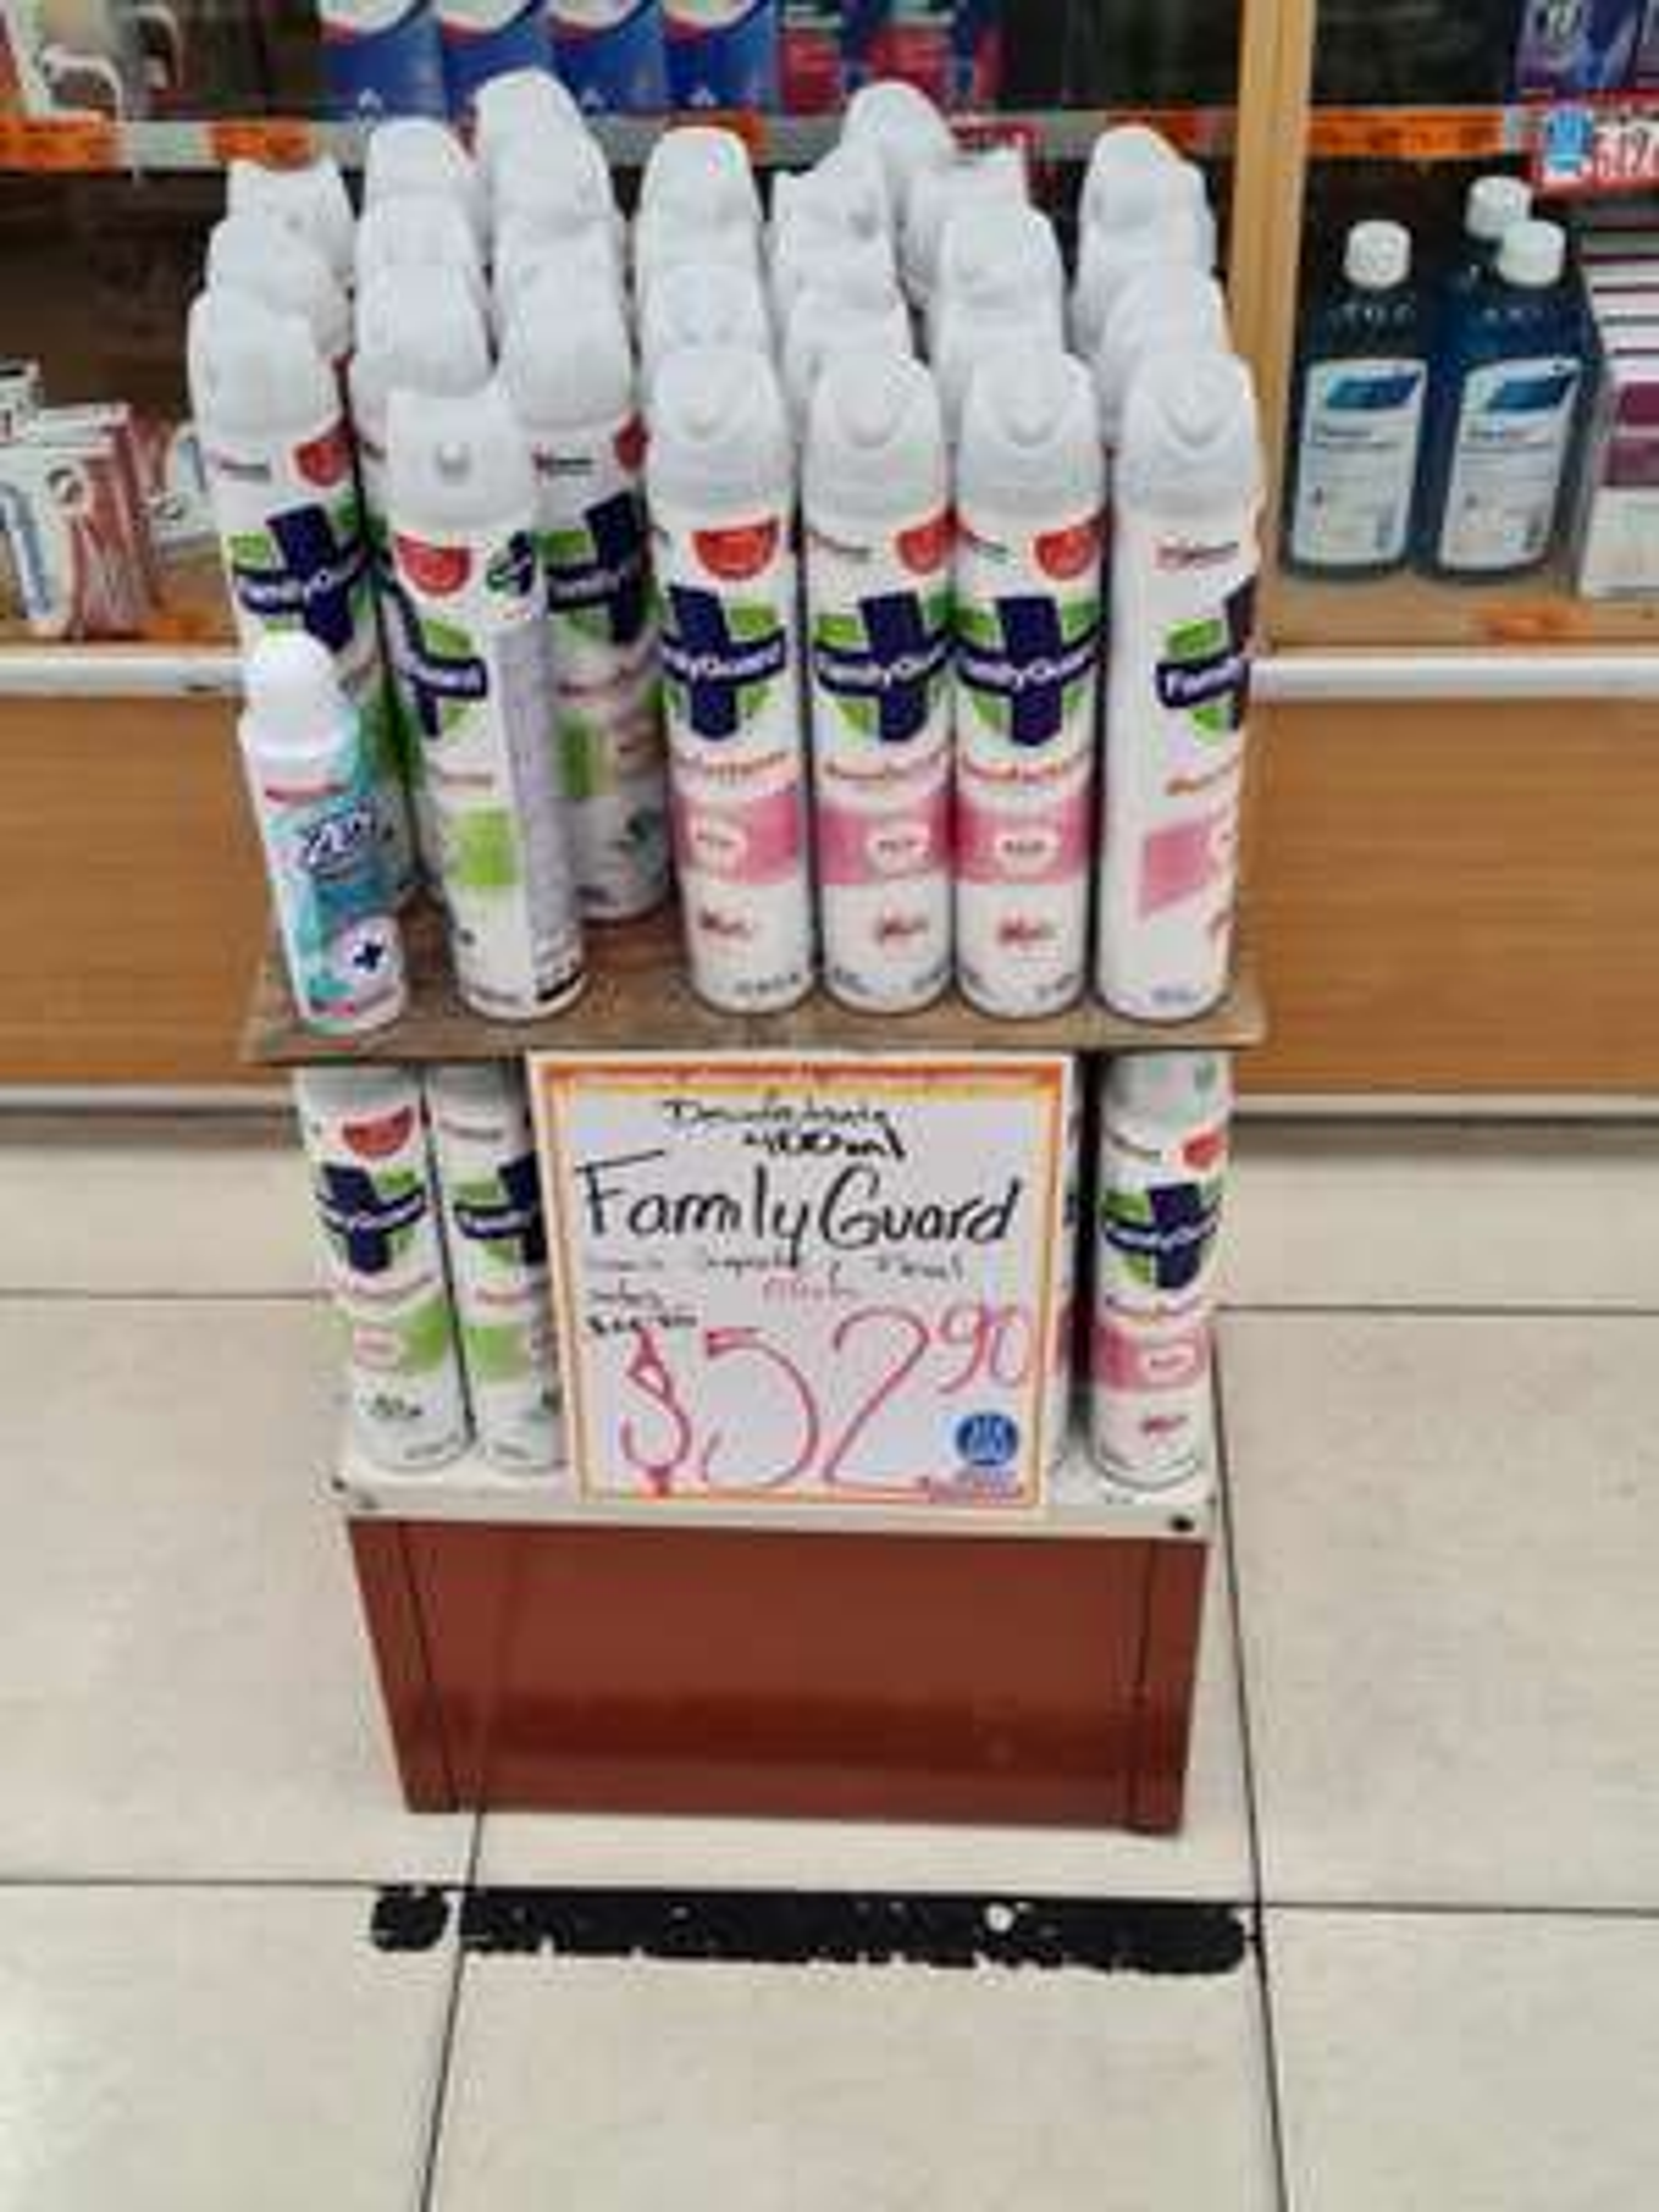 Desinfectante Family Guard - Farmacias Guadalajara